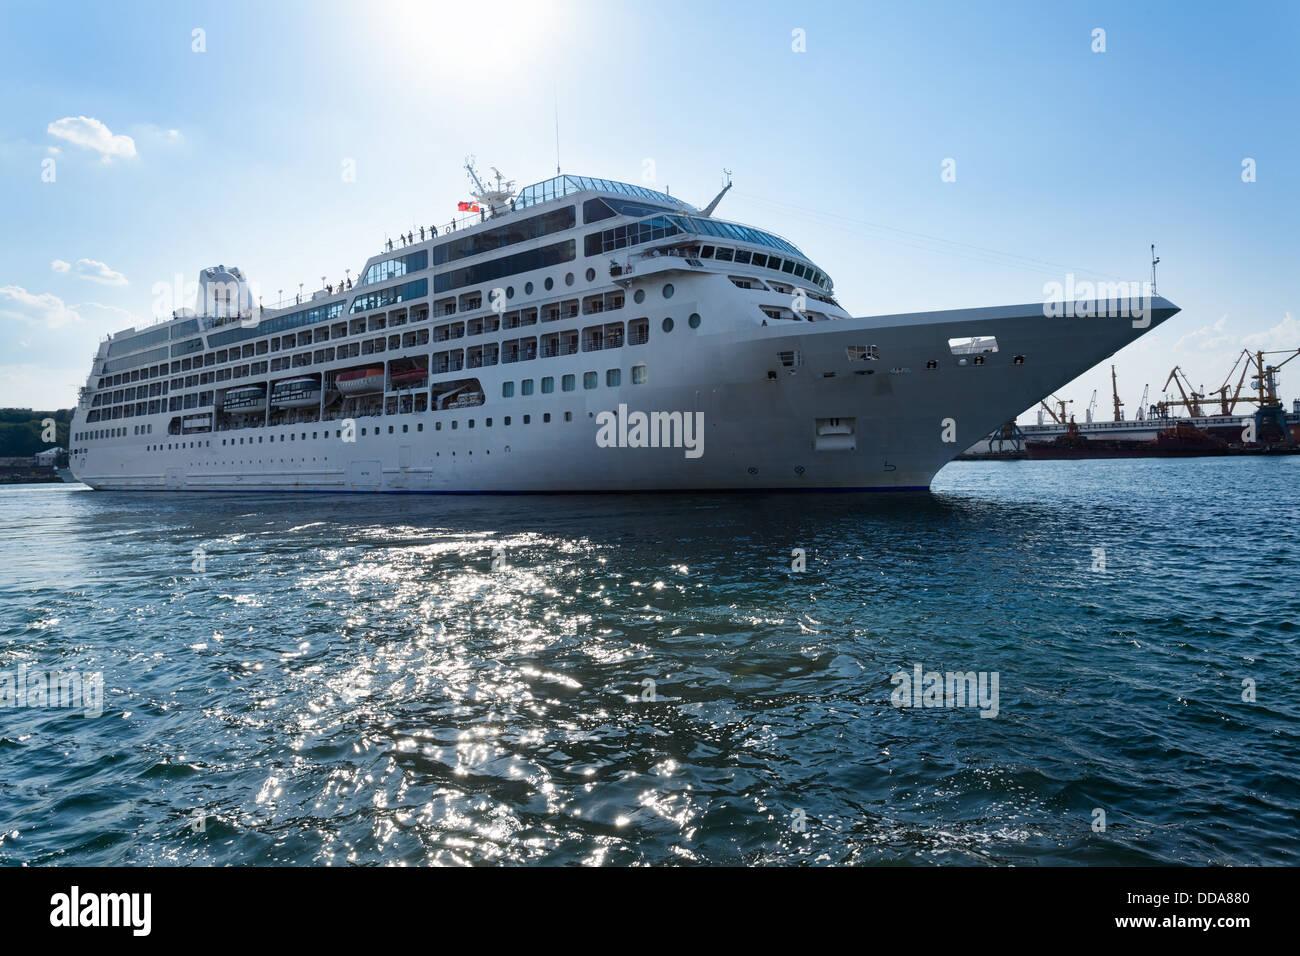 passenger ship afloat sparkling sea - Stock Image